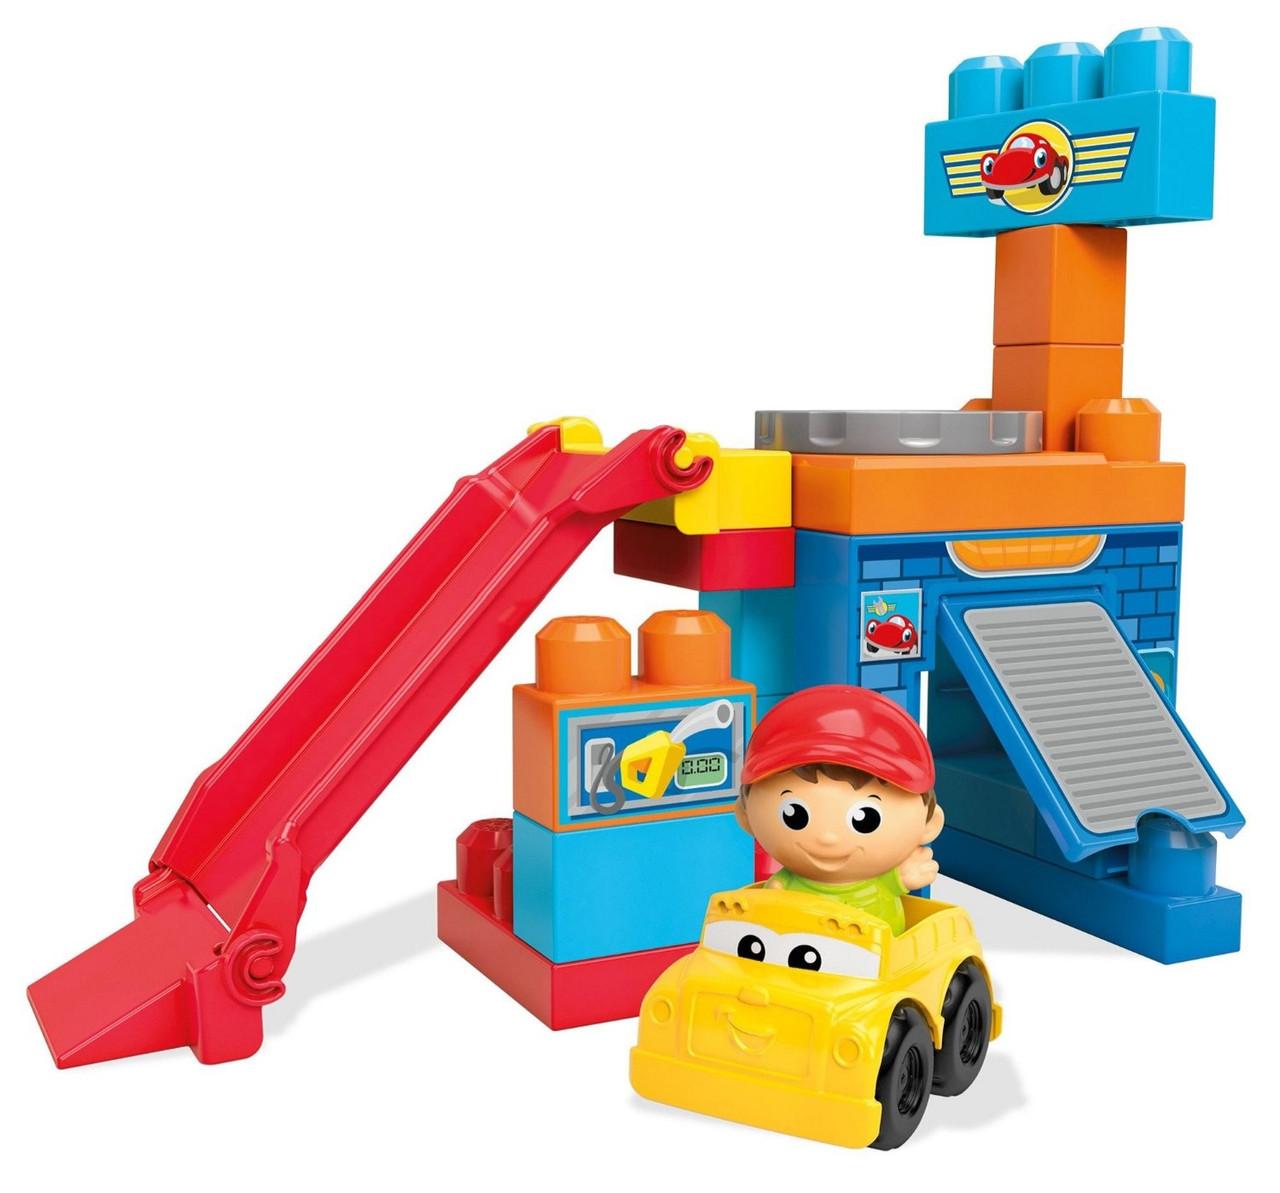 Mega Bloks First Builders Первые строители Игровой набор Гараж Spin 'n Play Spinning Garage Playset DKX85